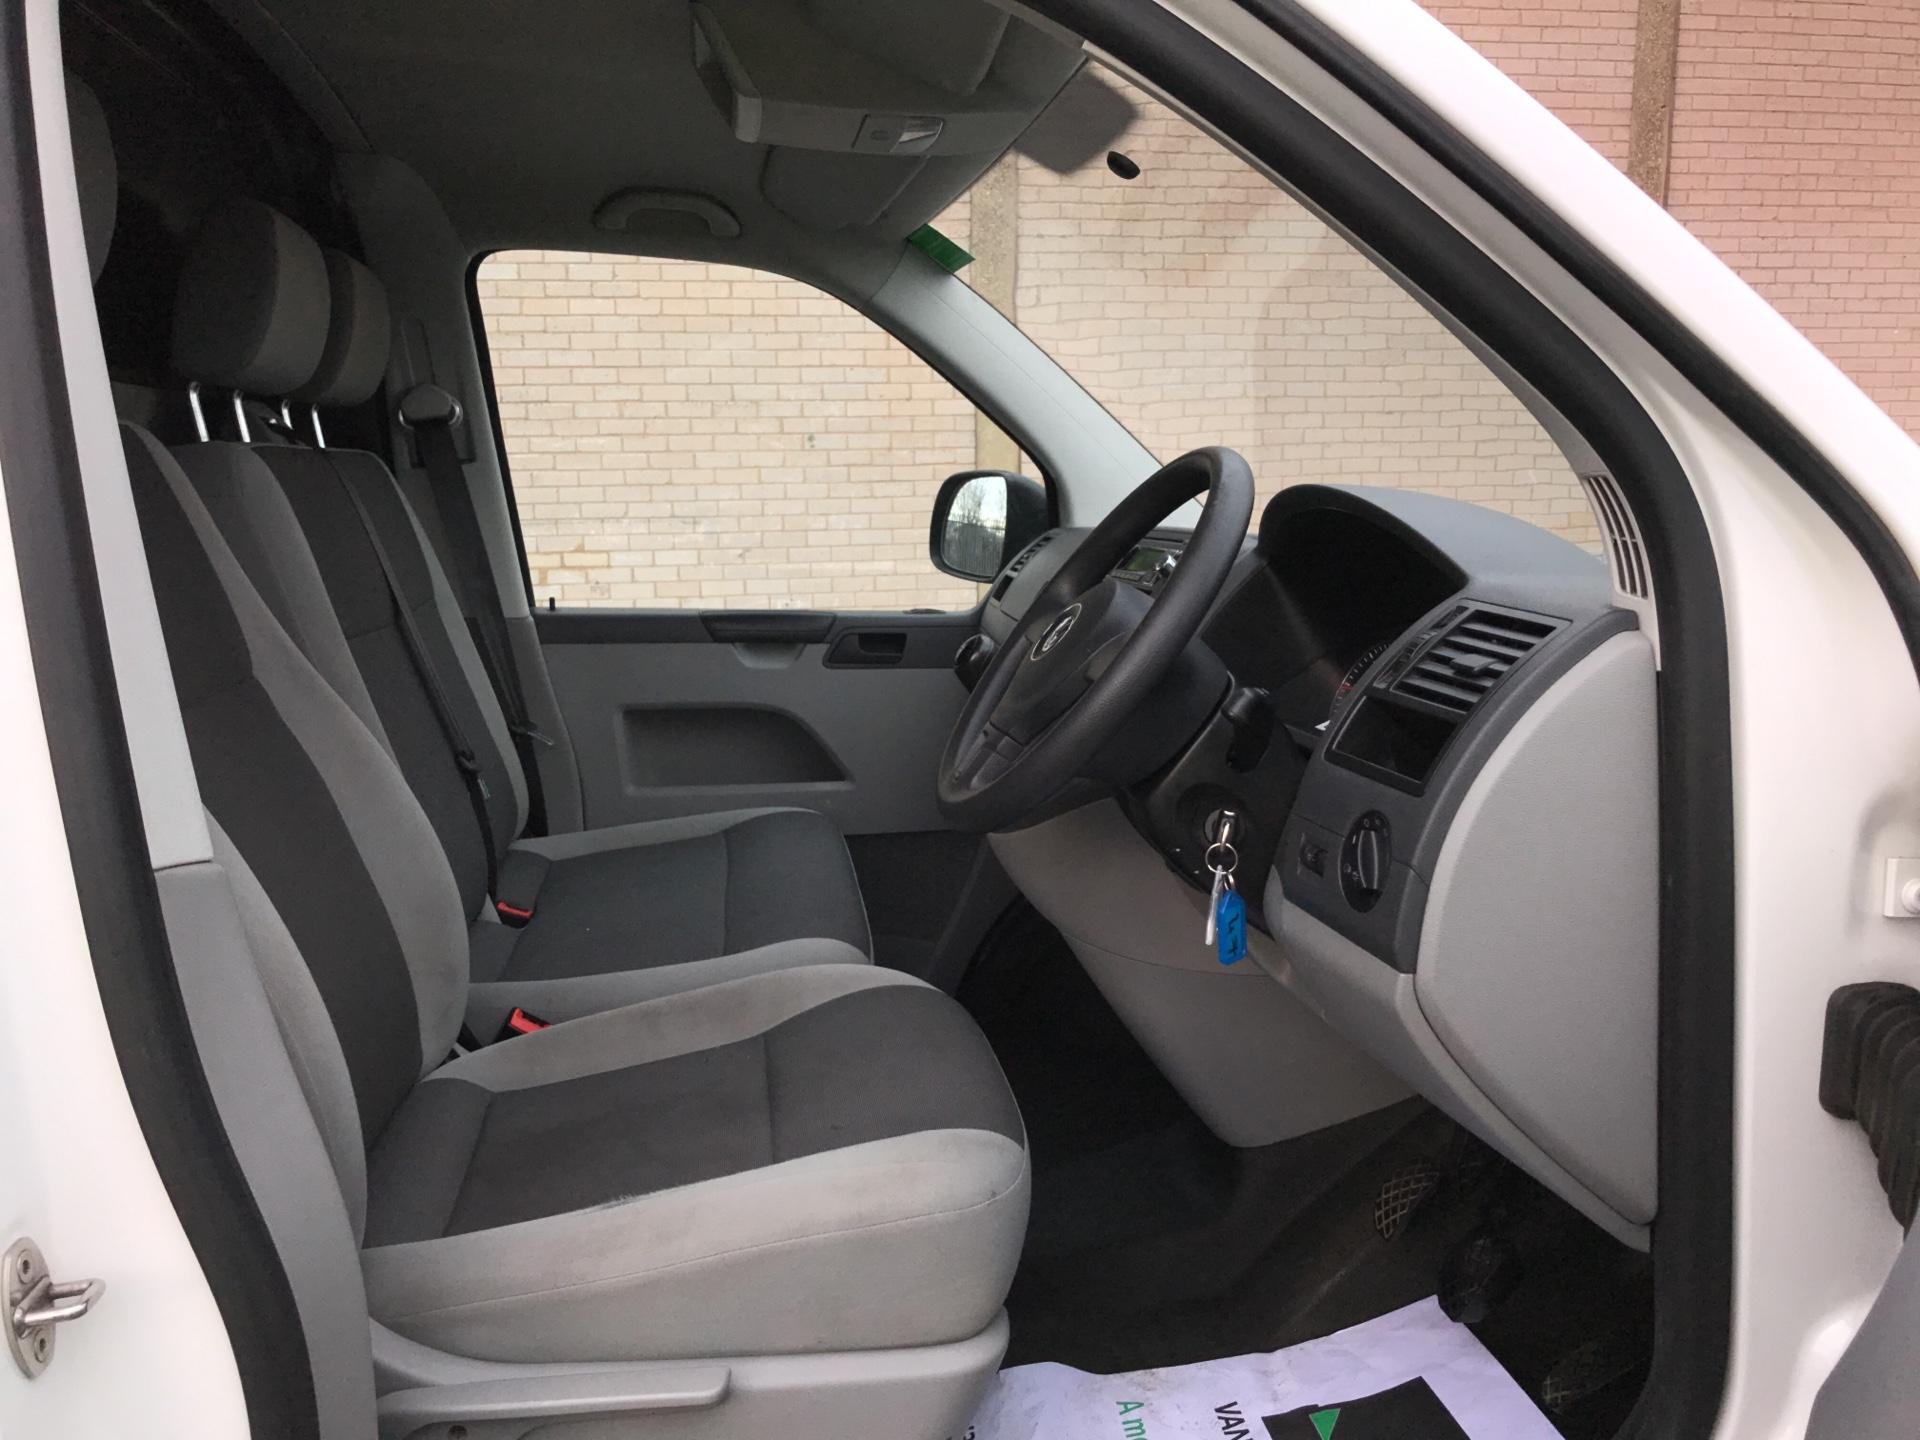 2014 Volkswagen Transporter  T28 SWB DIESEL 2.0 TDI 102PS STARTLINE EURO 5 *VALUE RANGE VEHICLE - CONDITION REFLECTED IN PRICE*  (NL64VEF) Image 9